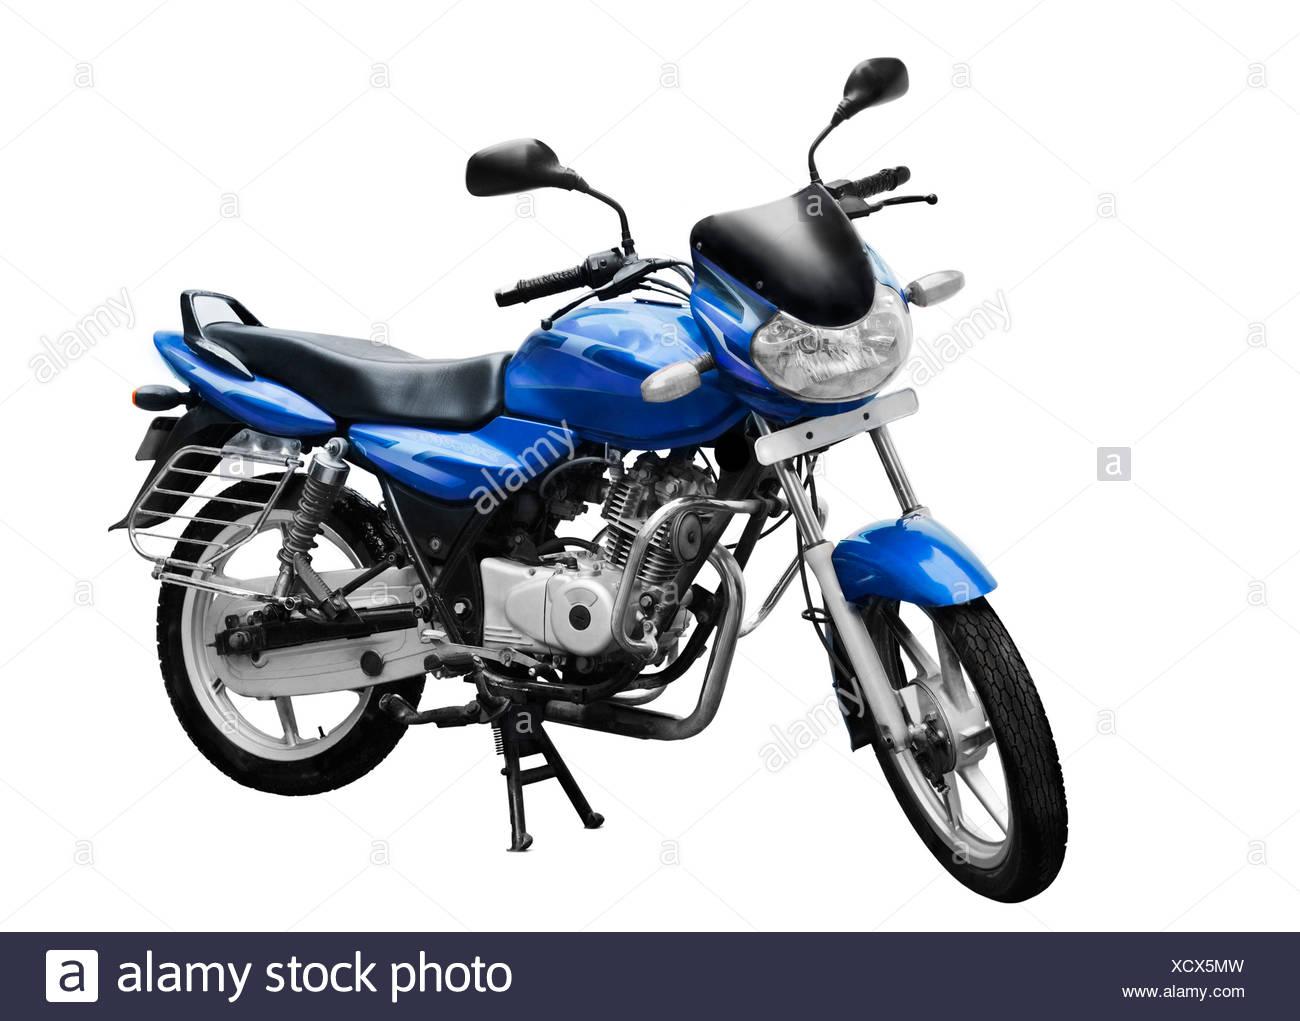 Motorbike - Stock Image